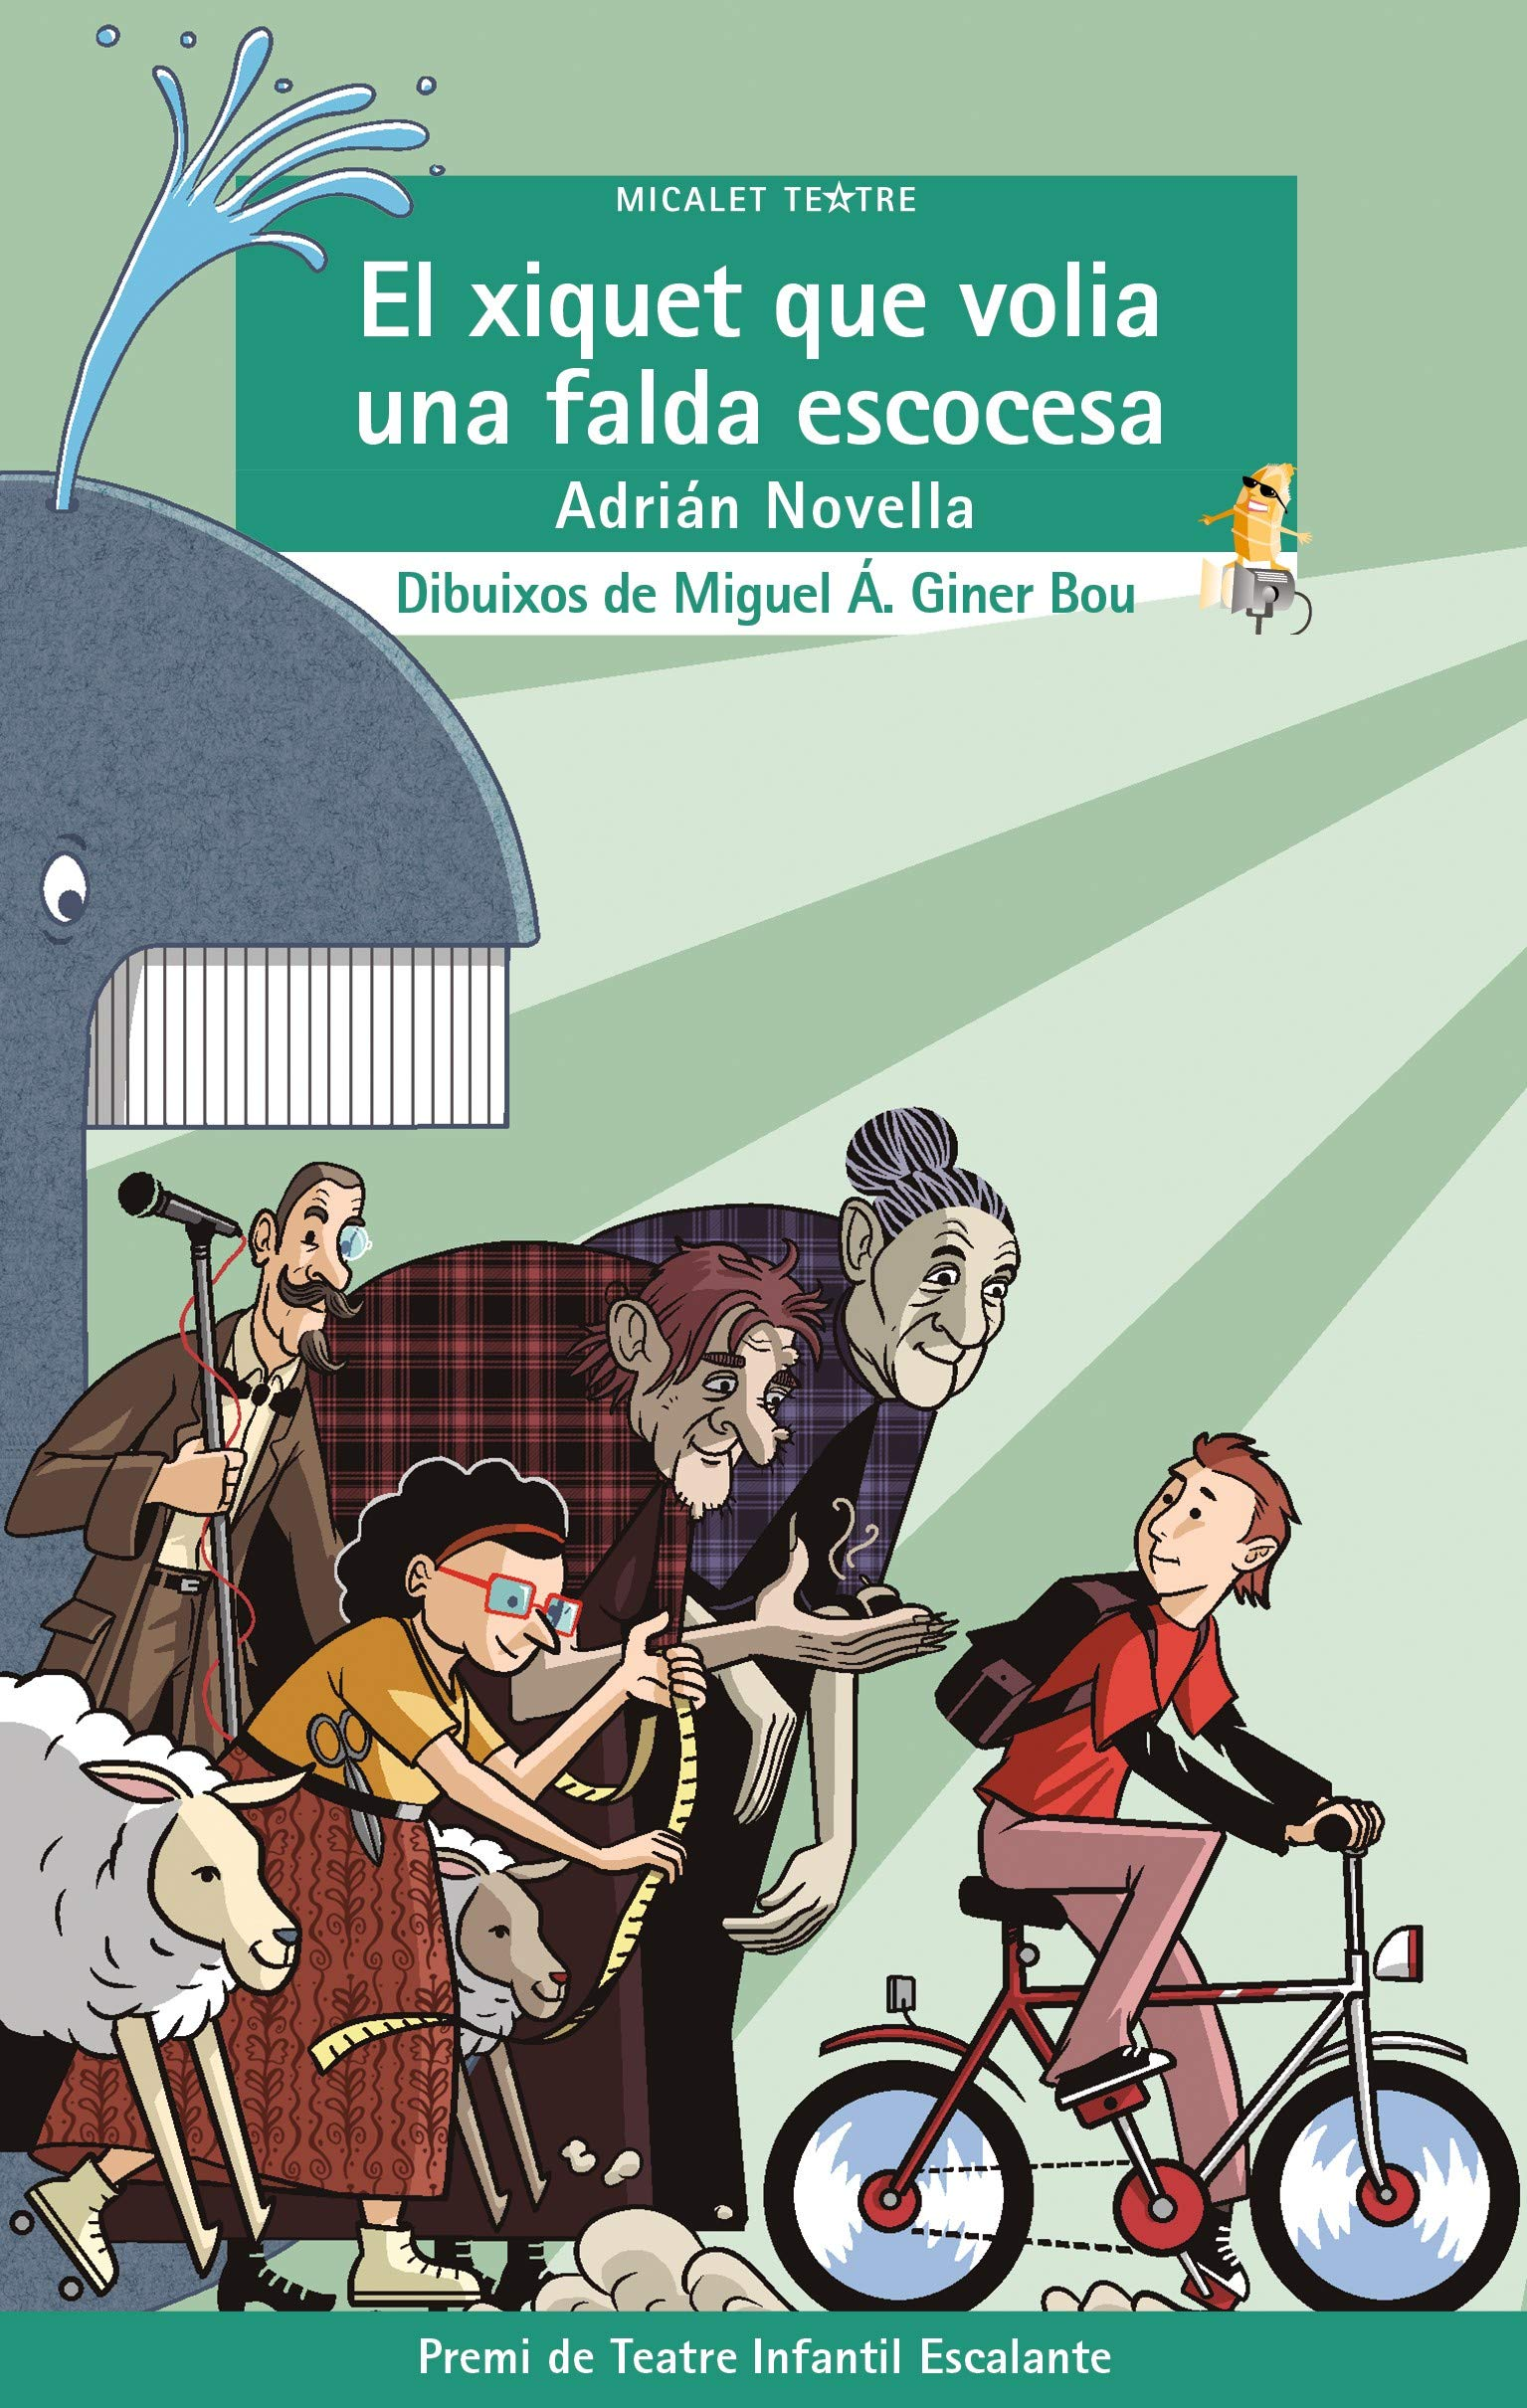 El xiquet que volia una falda escocesa: 50 Micalet Teatre: Amazon ...